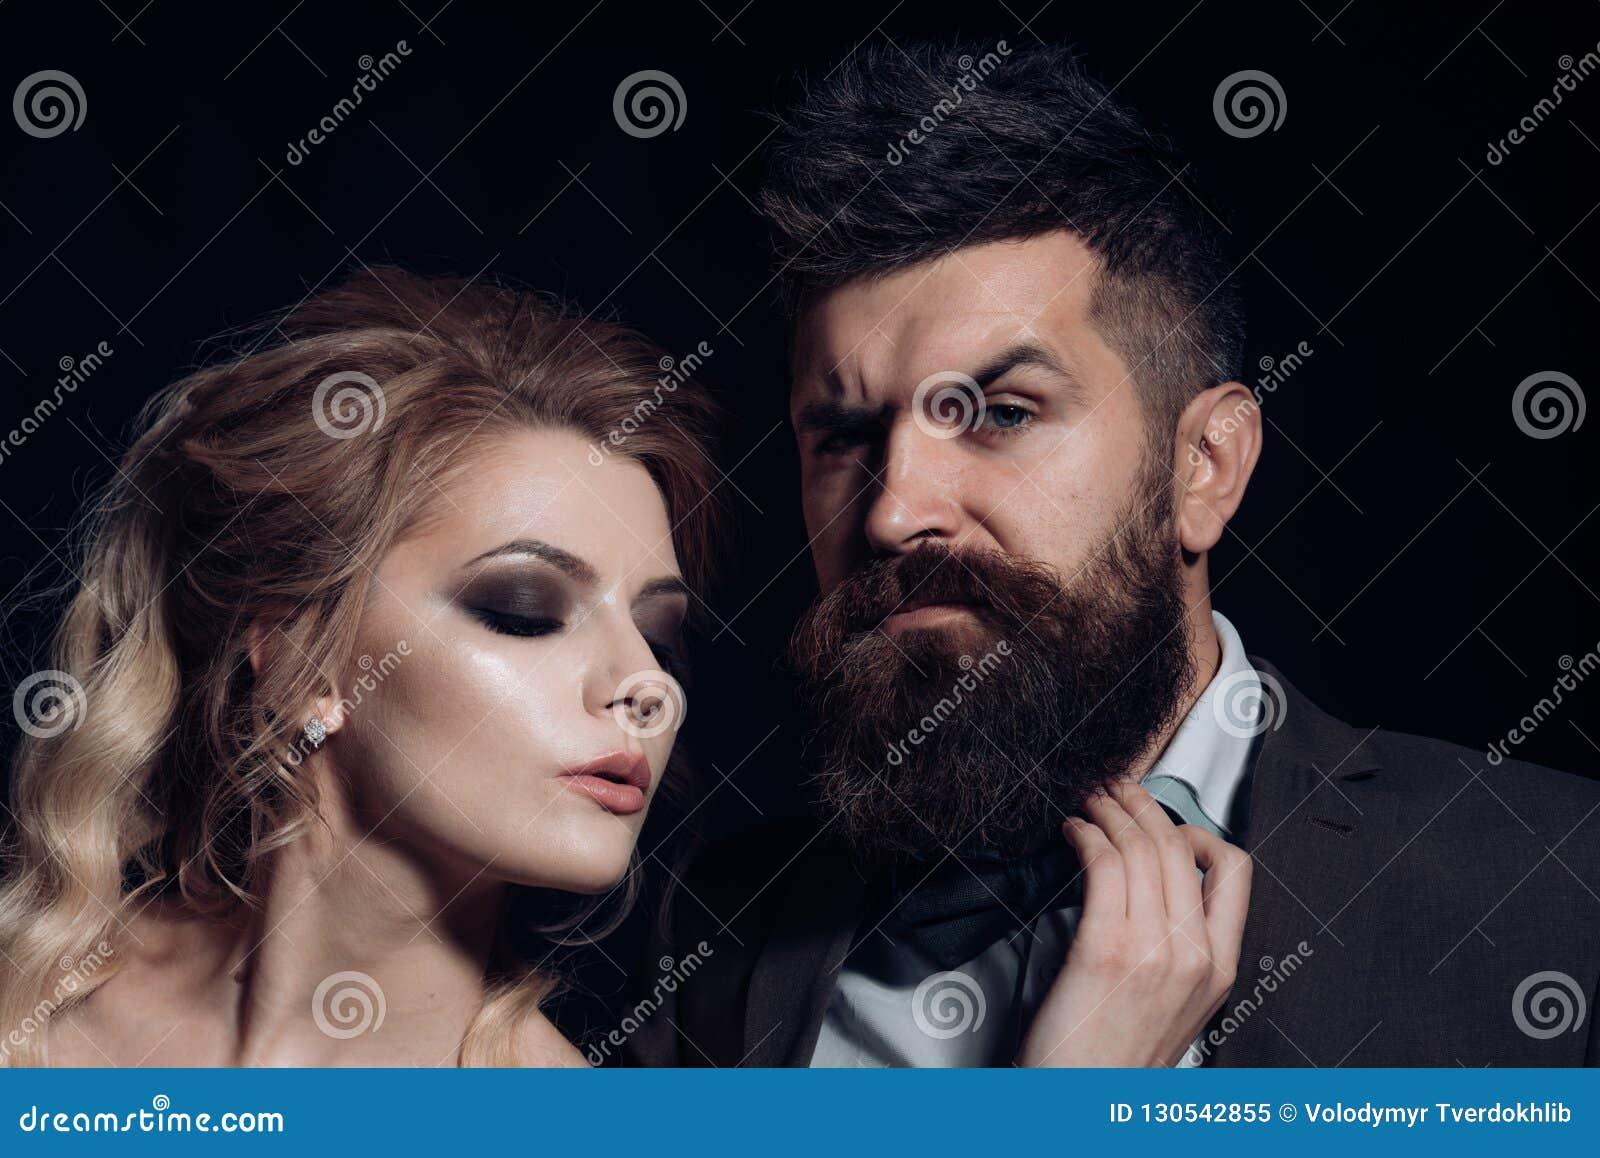 Dating blind man